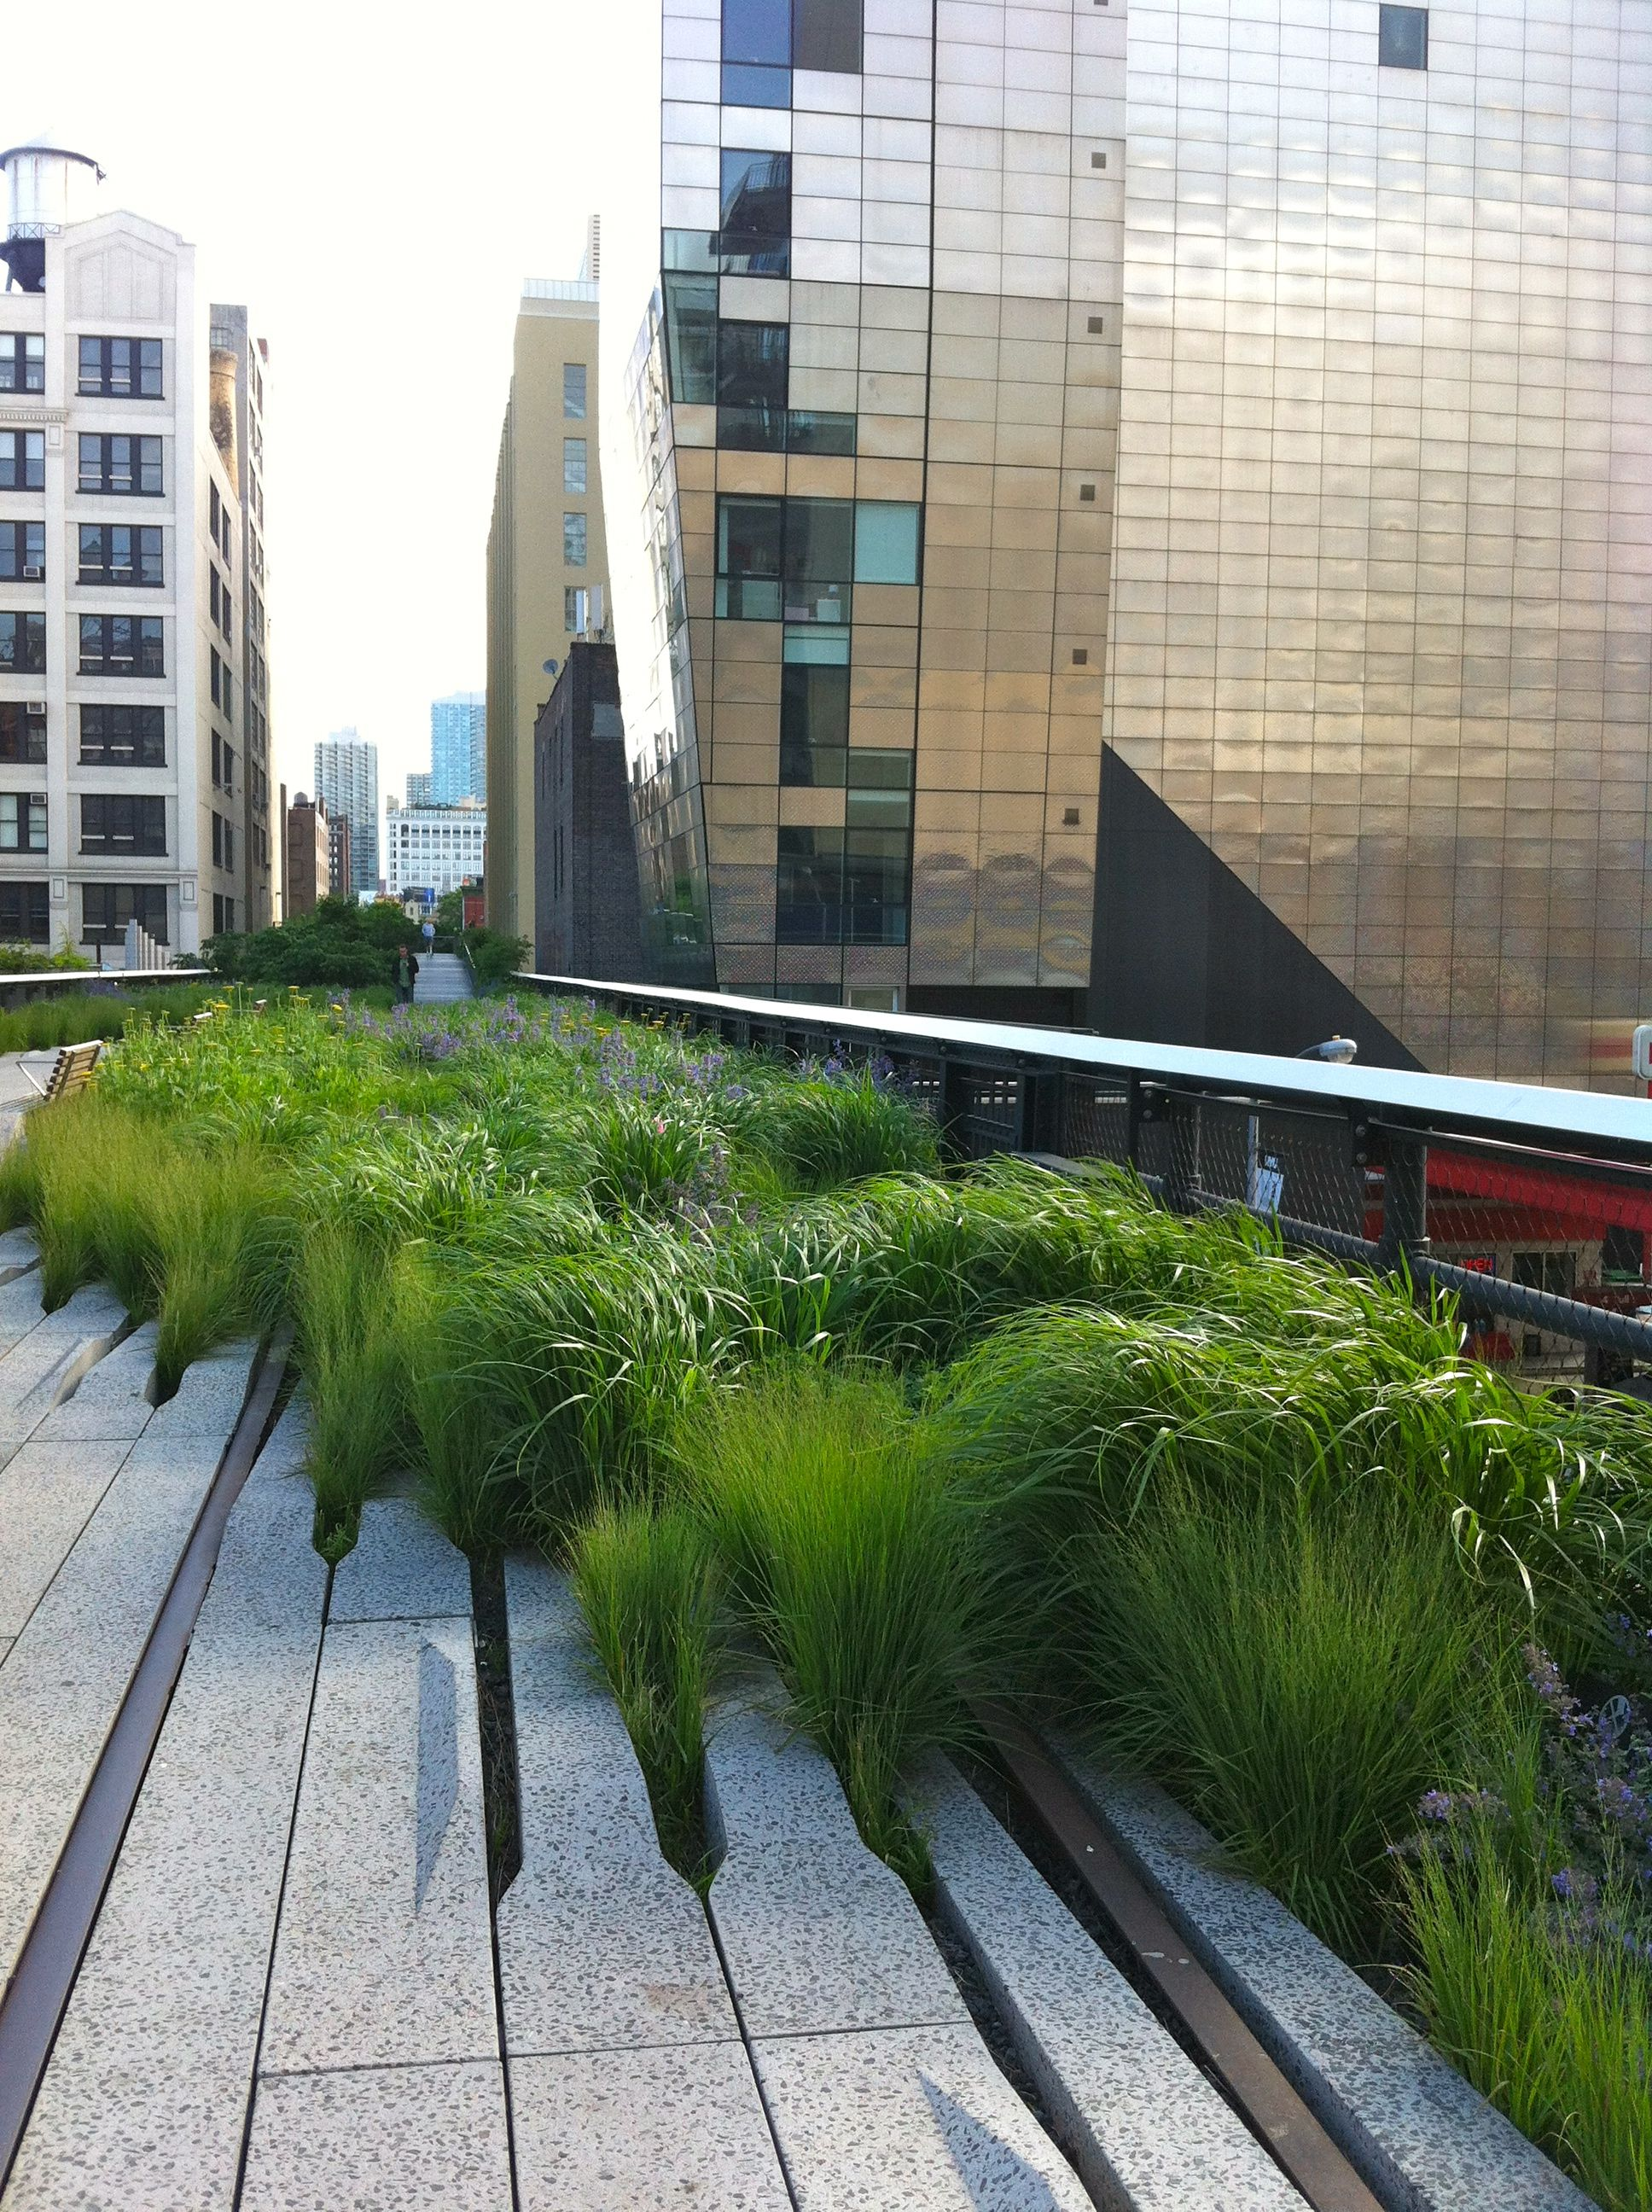 Concrete Patio Edge Ideas: Interesting Way To Merge Concrete Into Surrounding